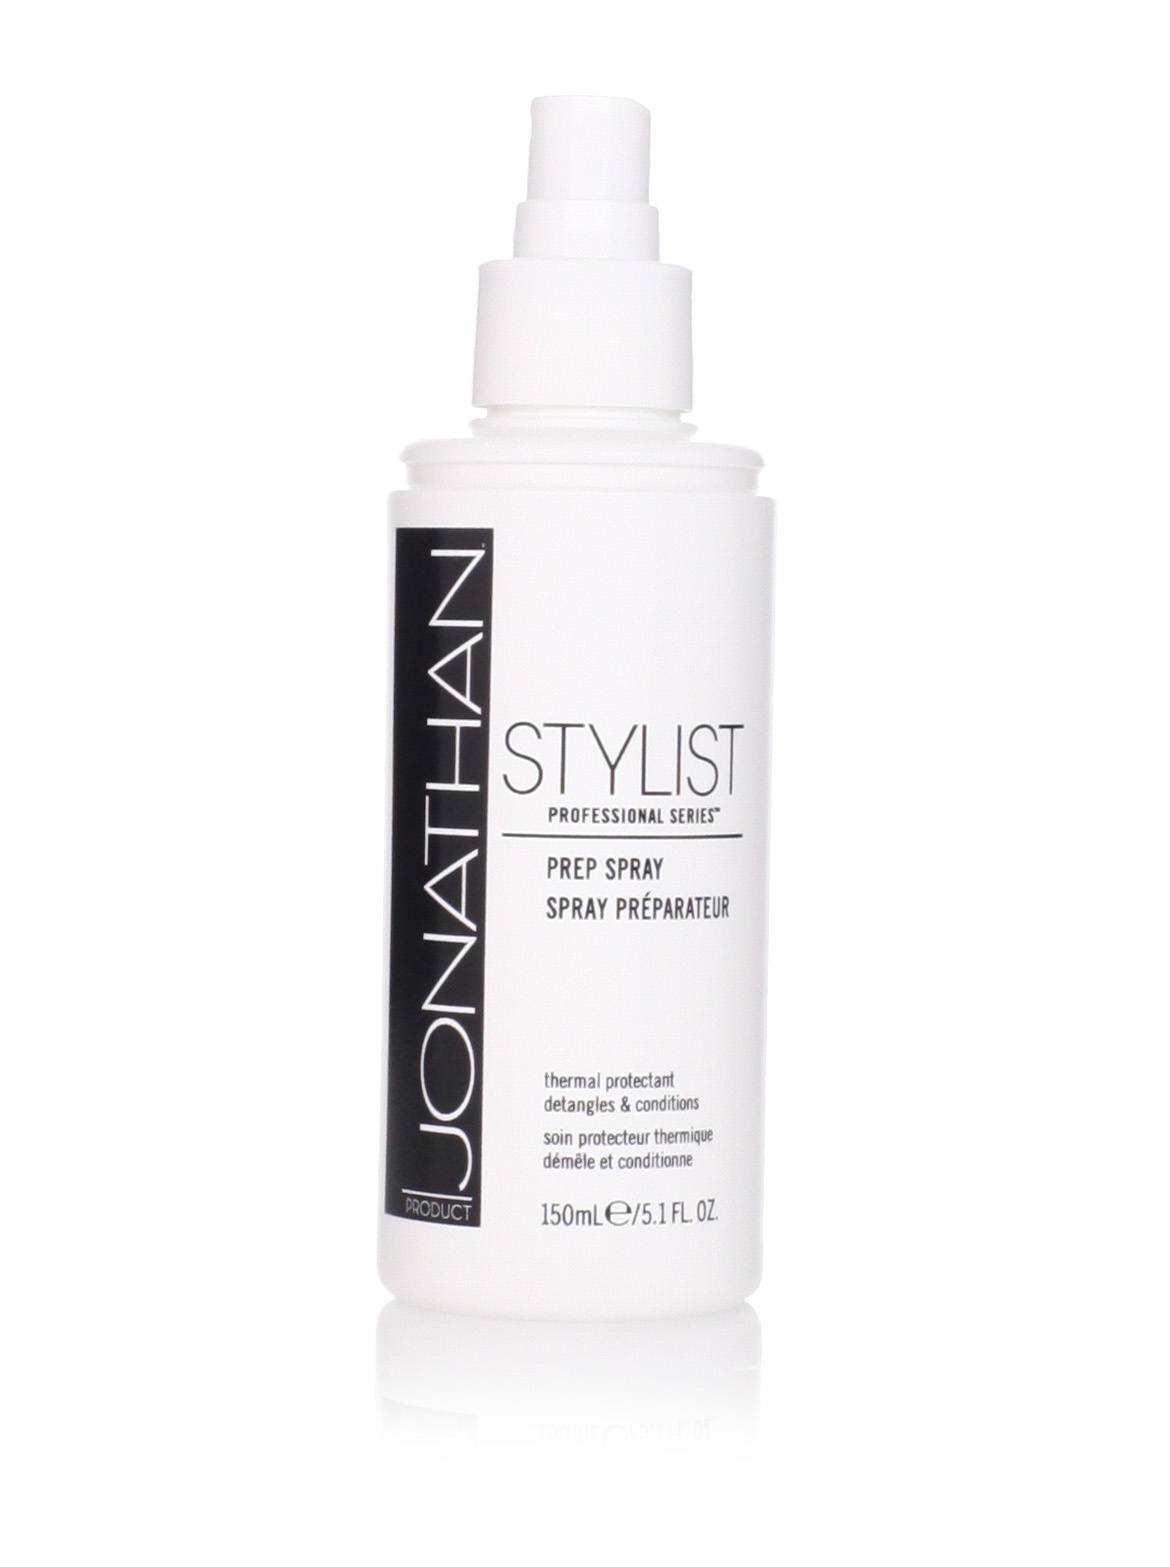 JONATHAN Stylist Professional Series Prep Spray, 5.1 fl oz